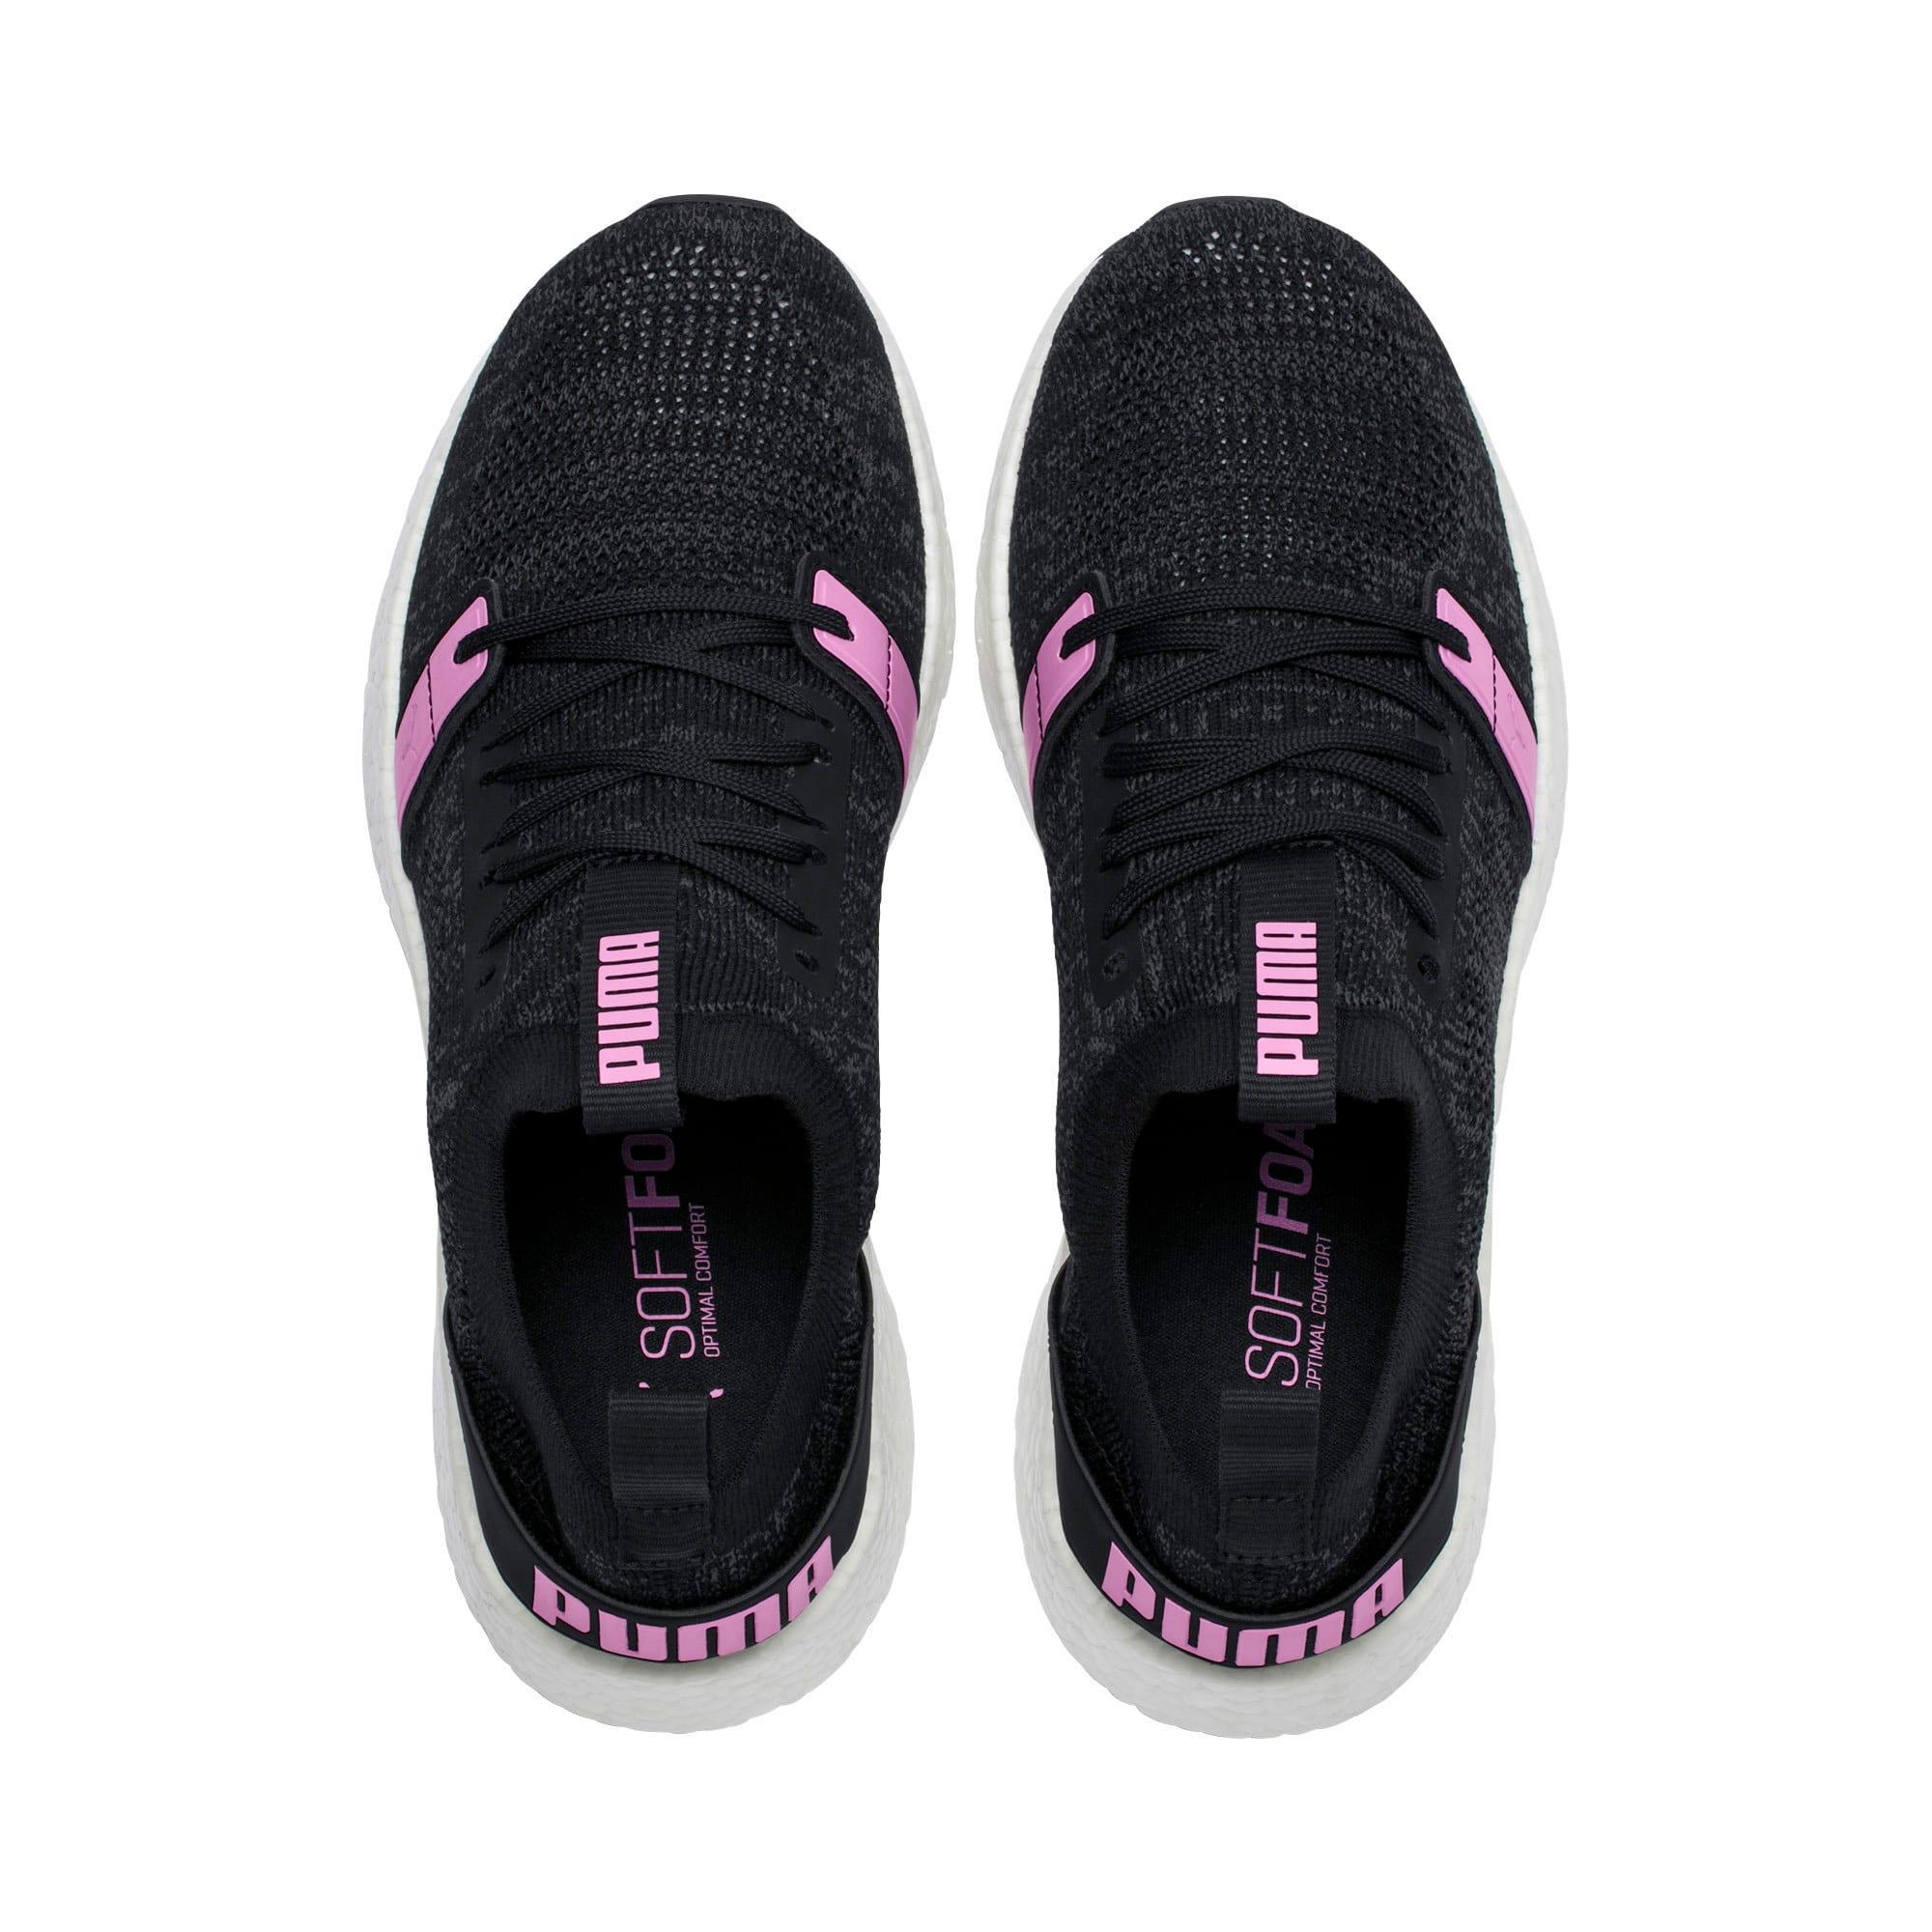 Thumbnail 6 of NRGY Neko Engineer Knit Women's Running Shoes, Puma Black-Iron Gate-Orchid, medium